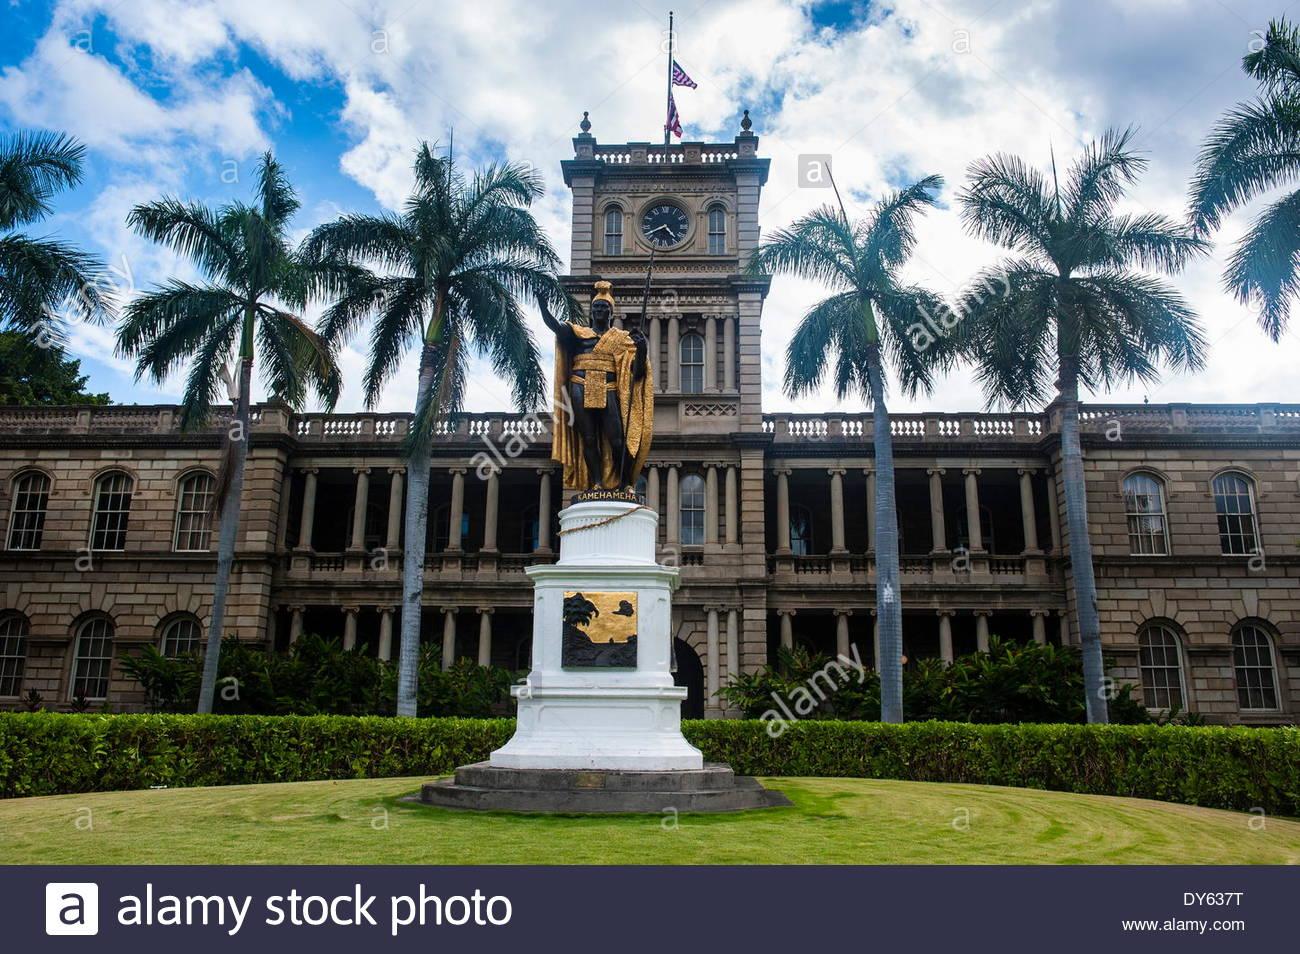 Iolani Palace, Honolulu, Oahu, Hawaii, United States of America, Pacific - Stock Image